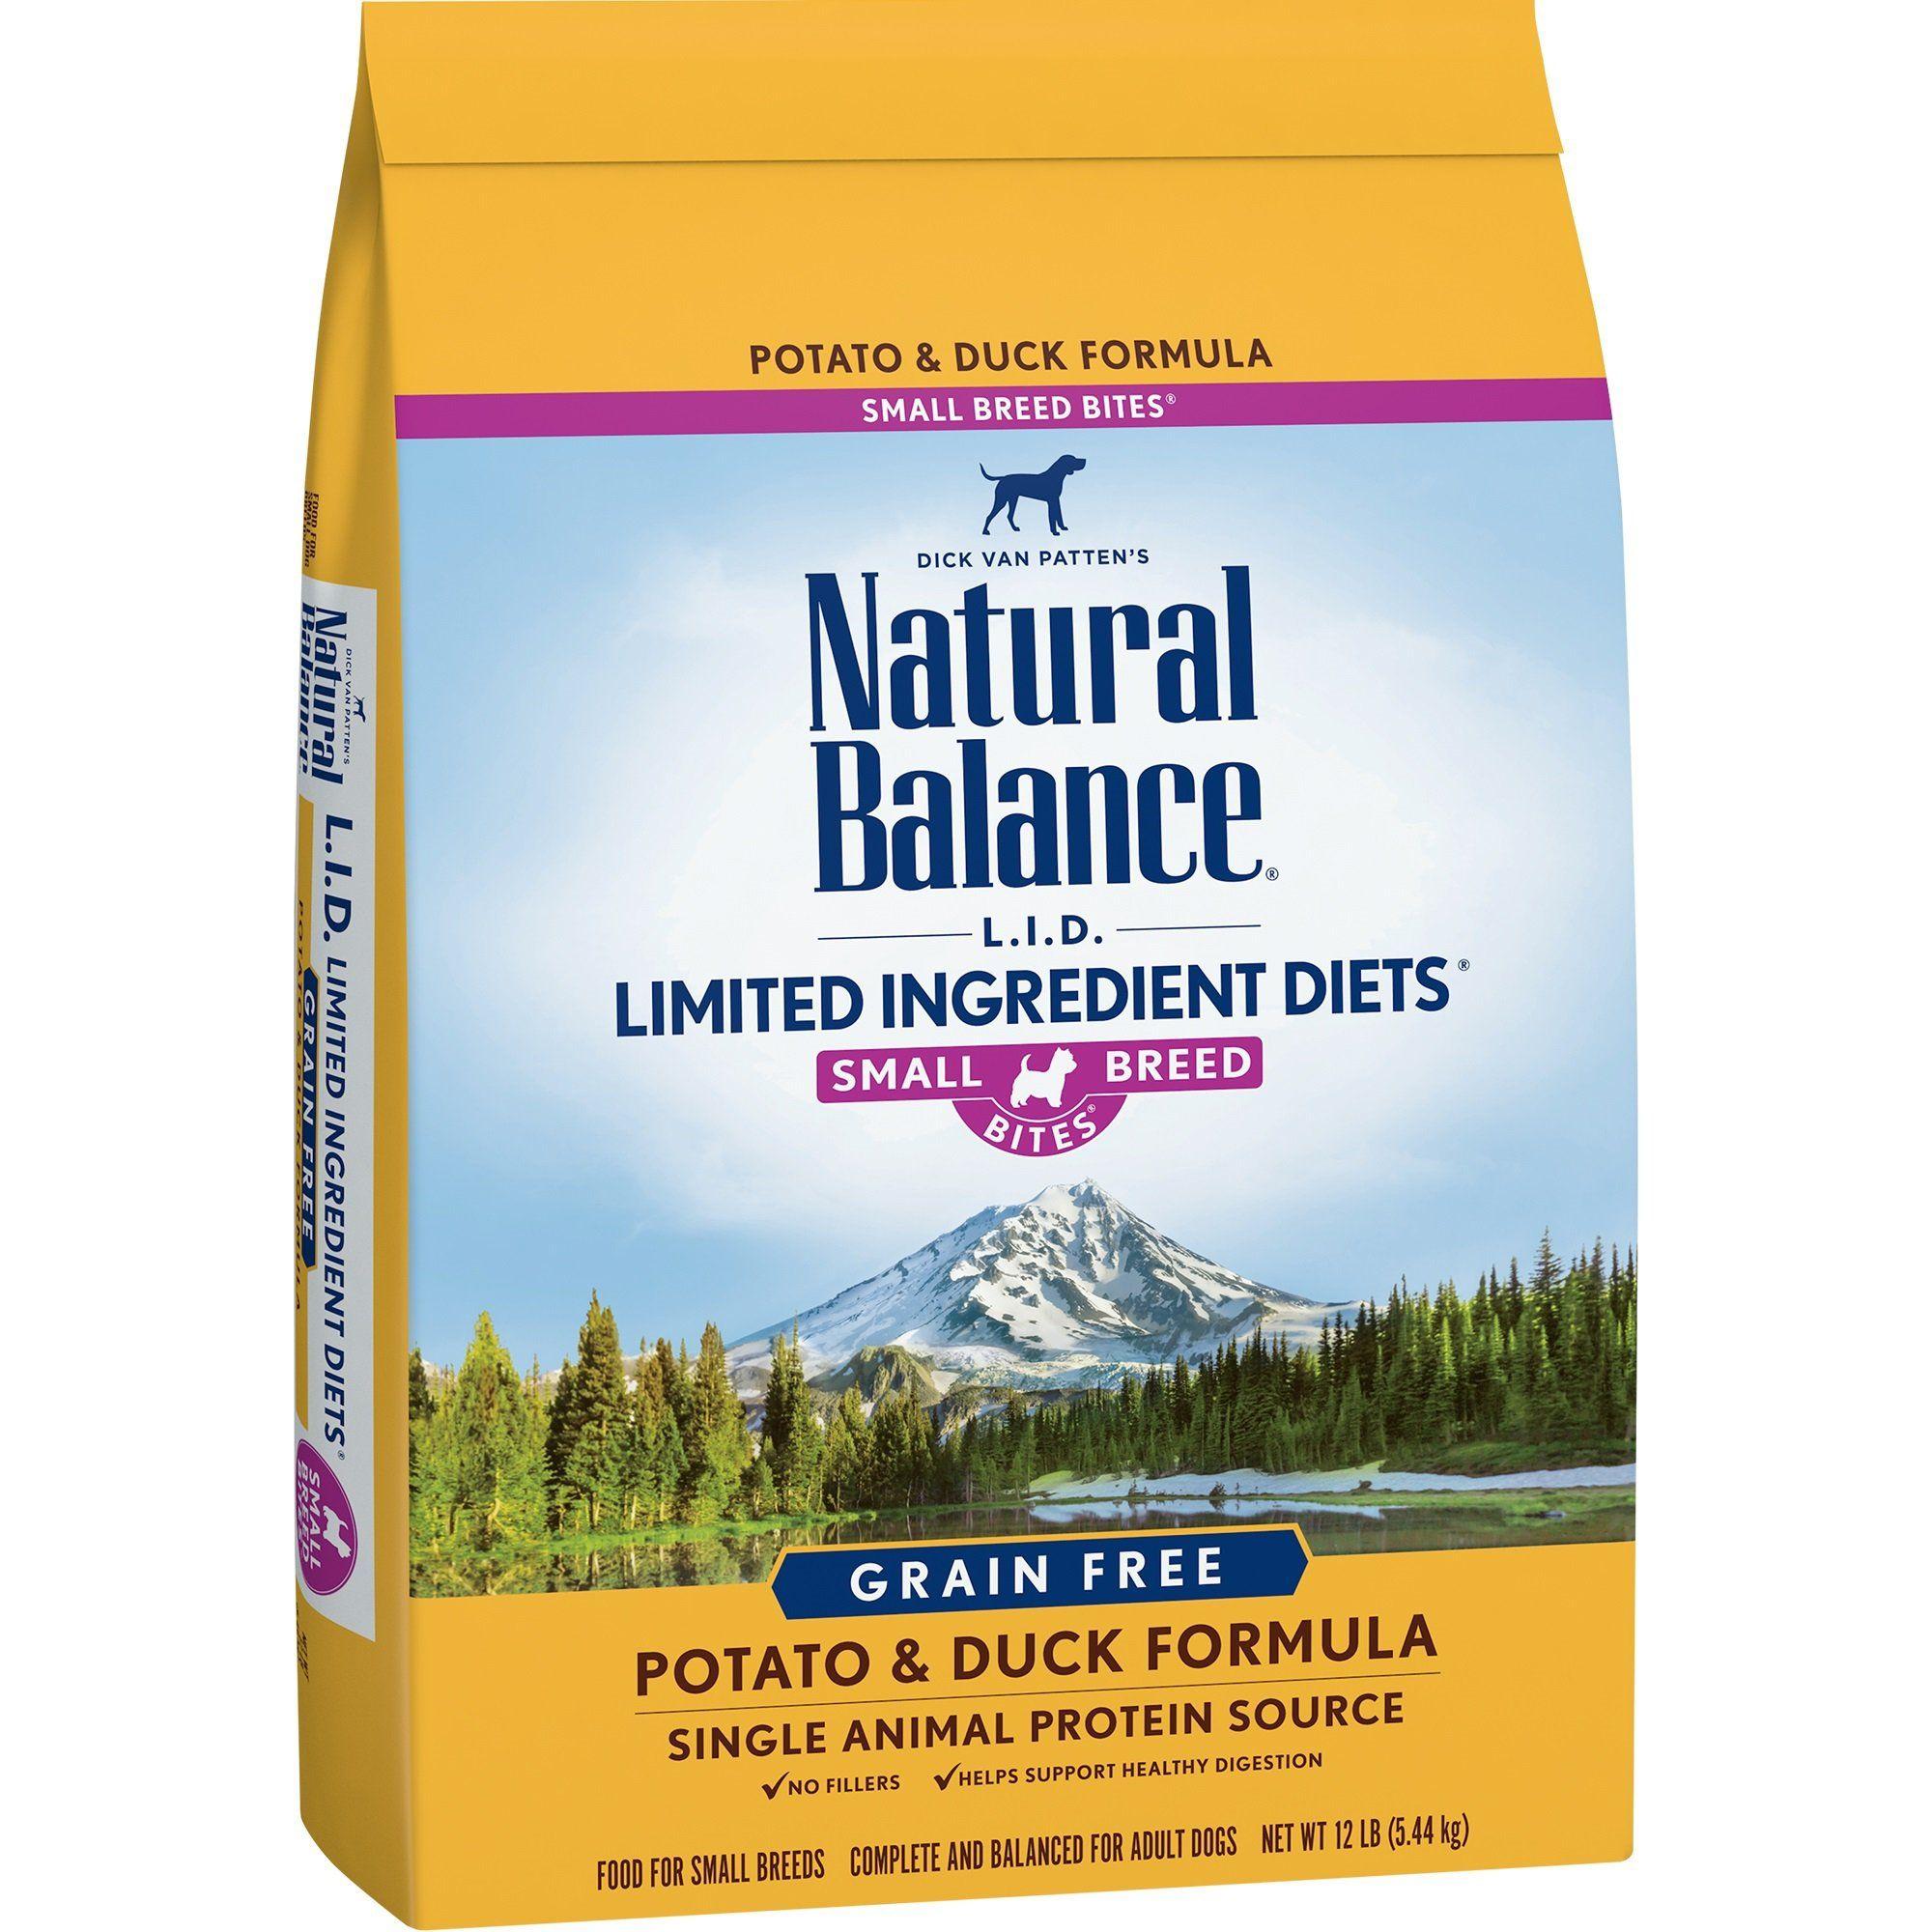 Natural Balance Small Breed Bites L.I.D. Limited